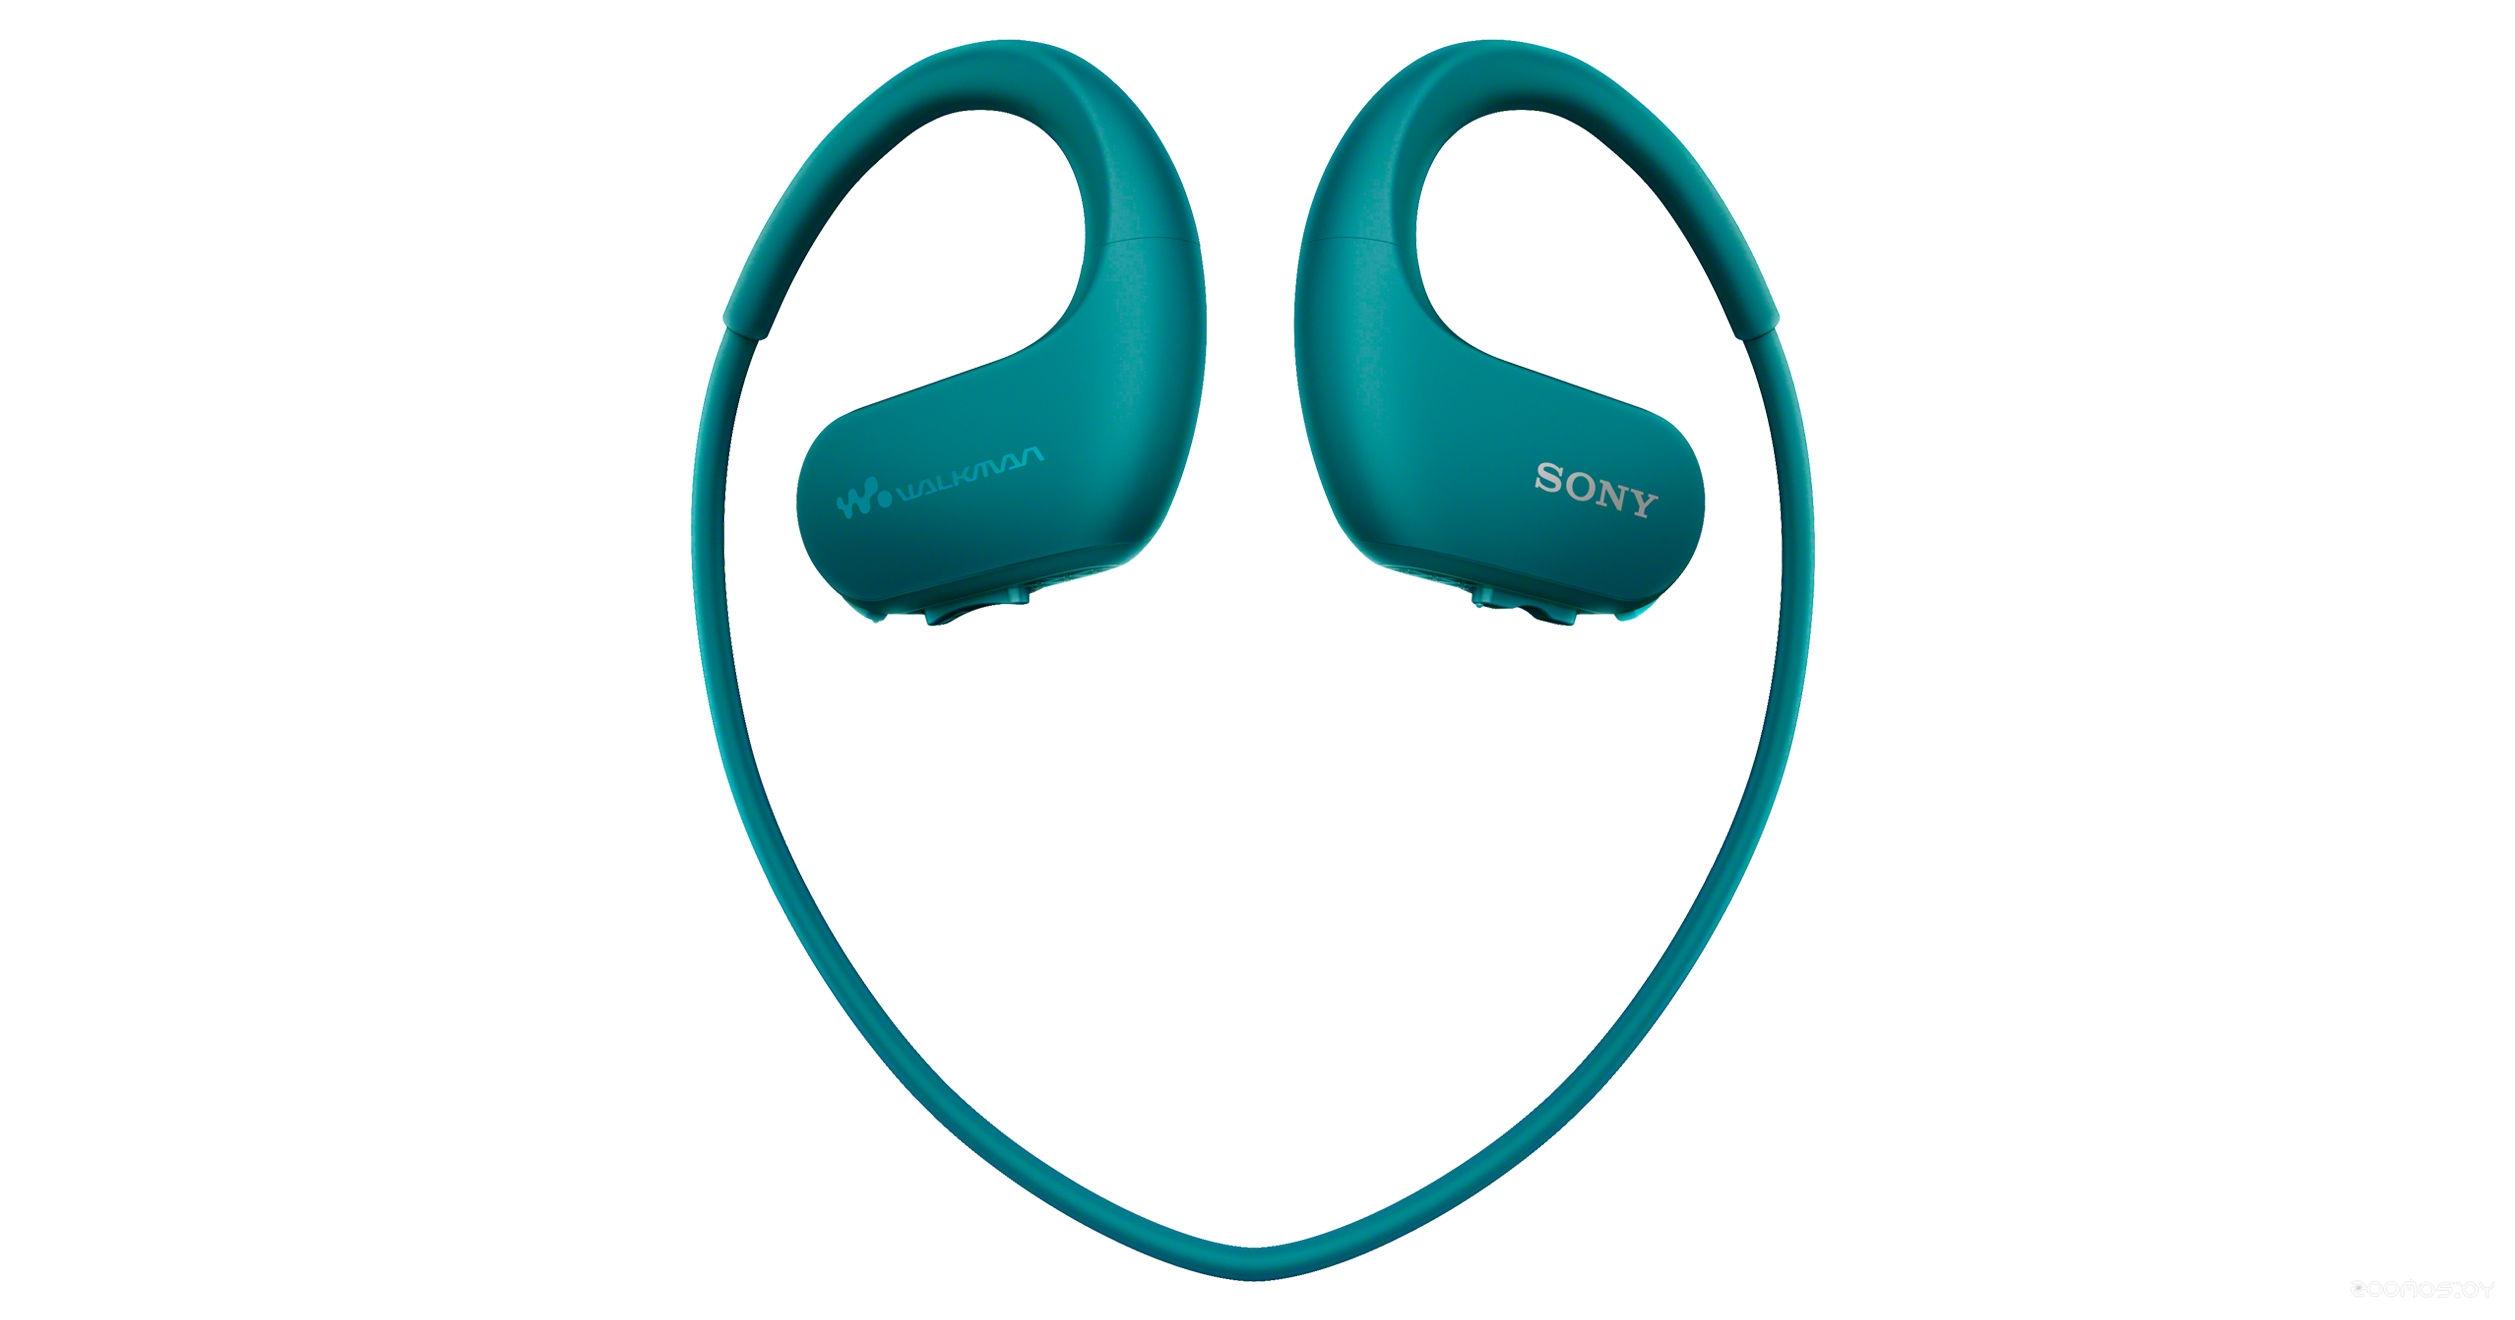 MP3-плеер Sony NW-WS414 (Sky-blue)